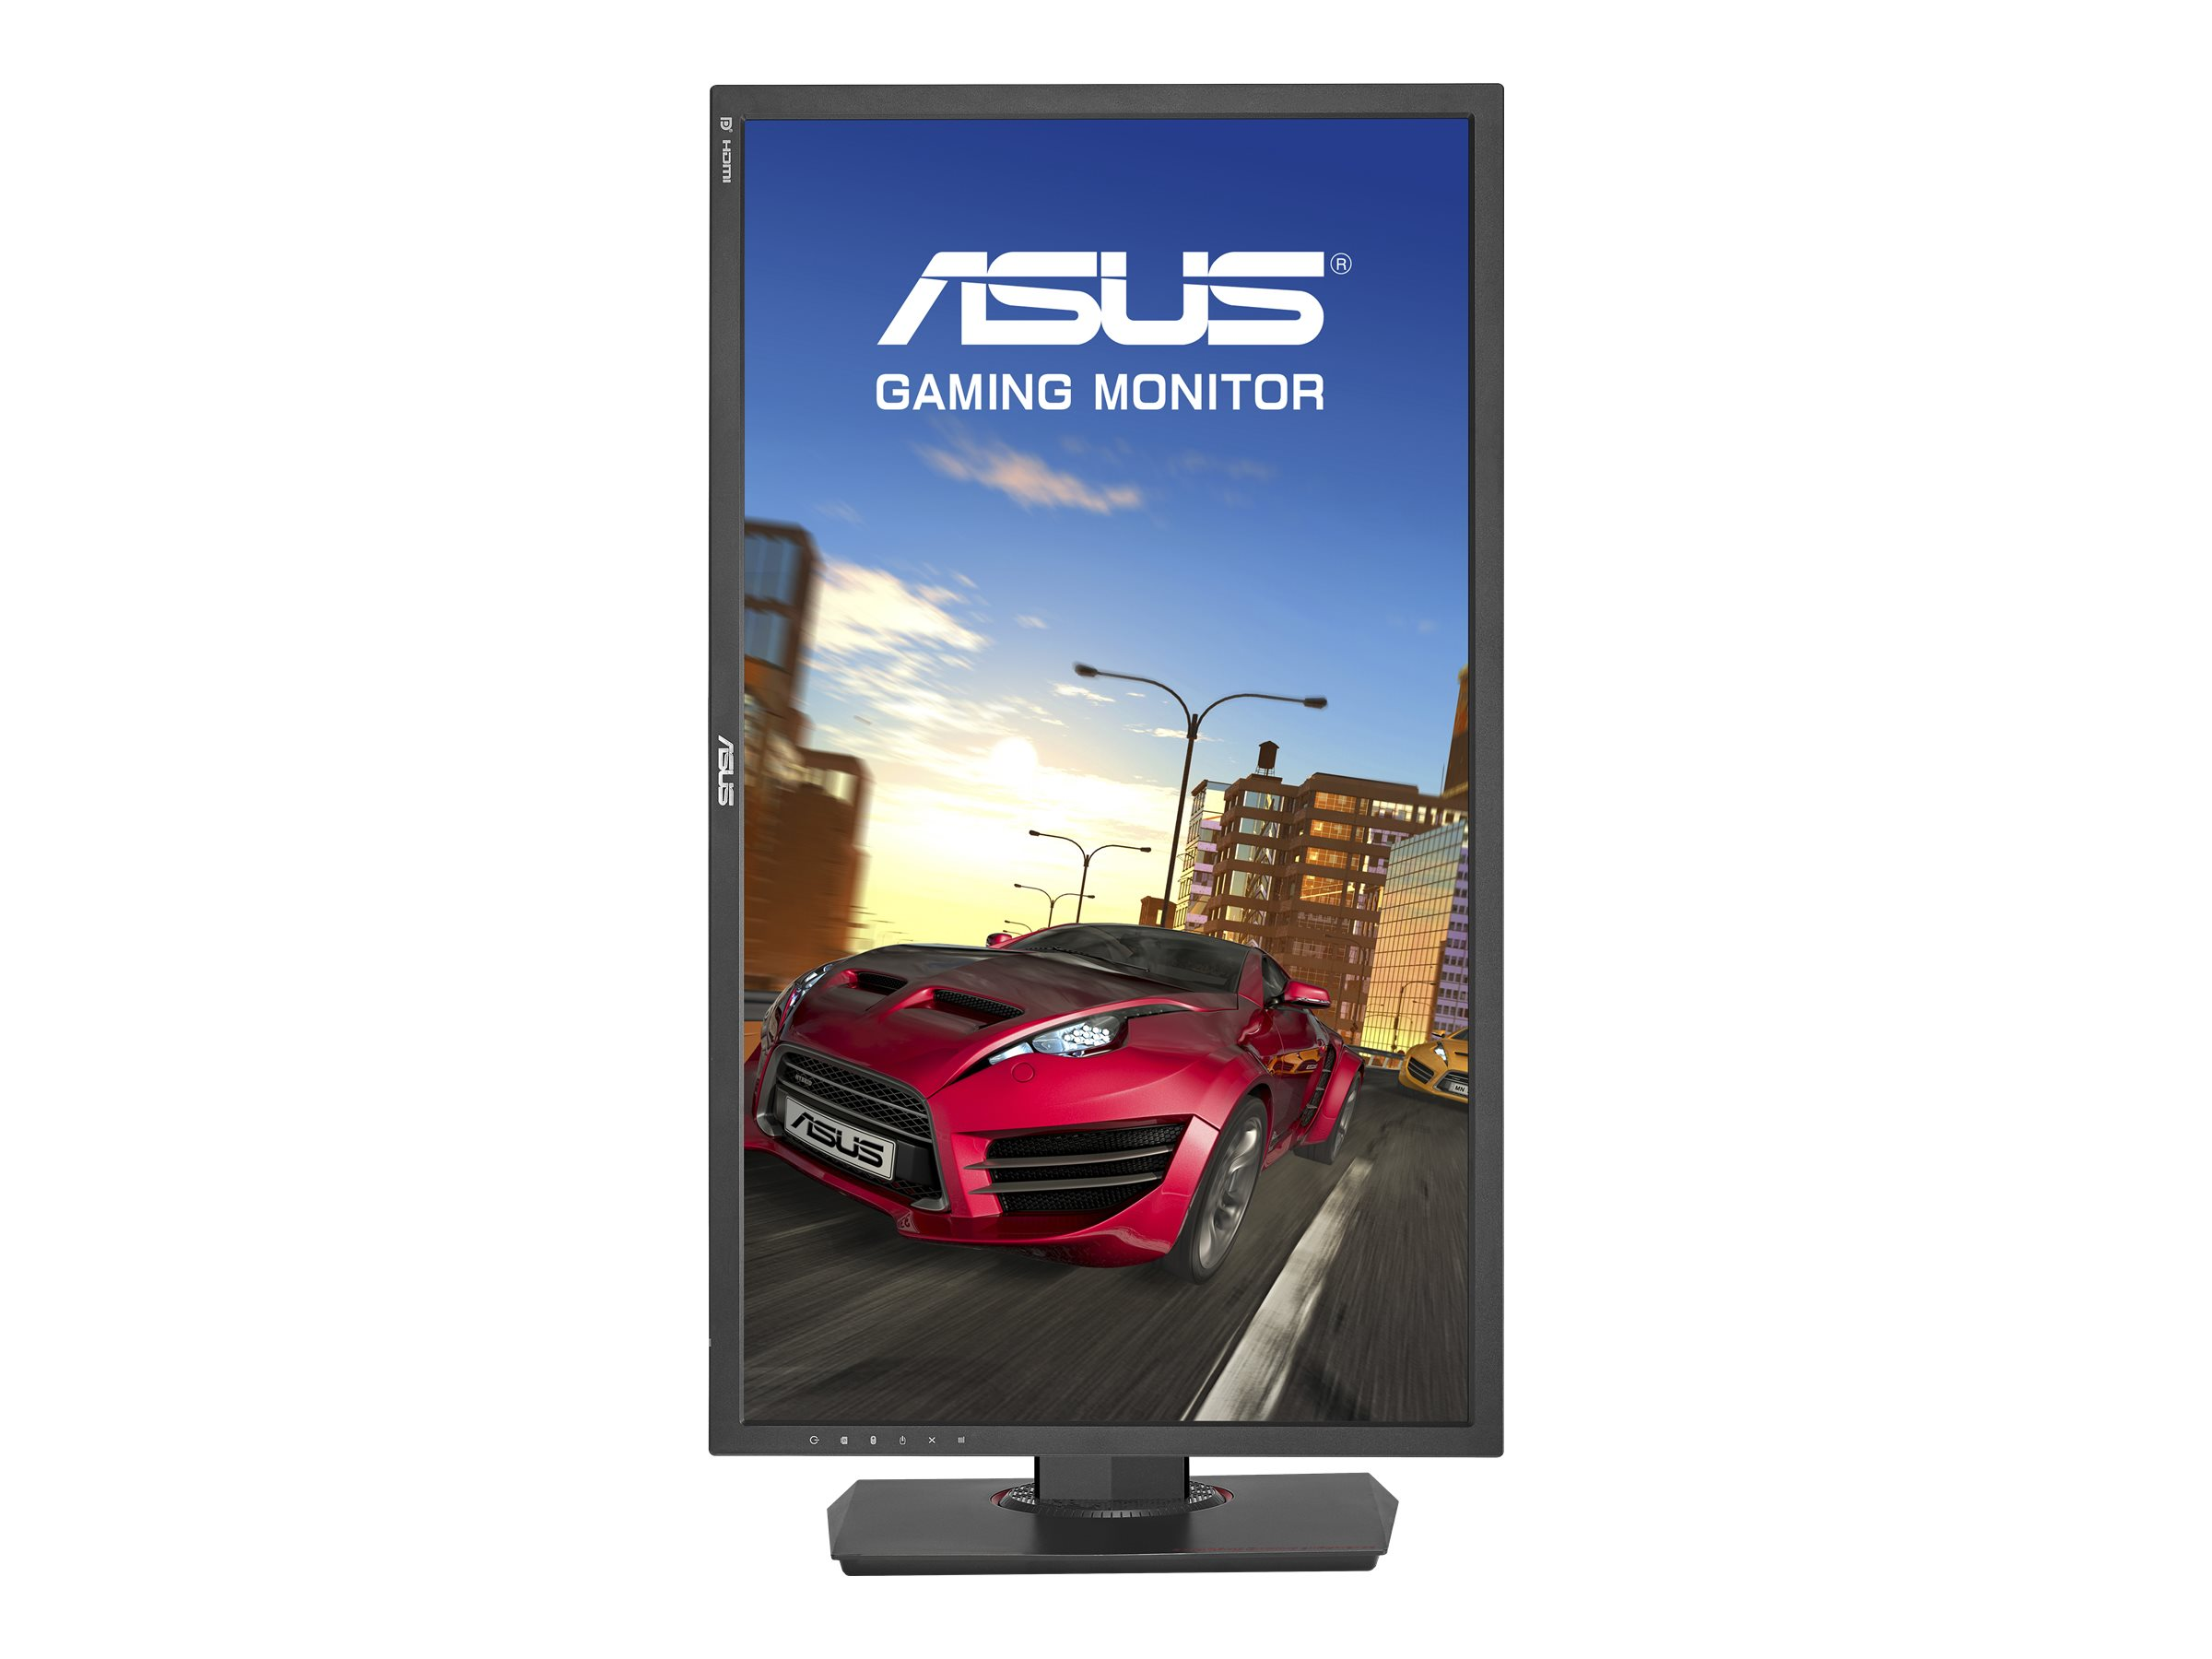 "ASUS MG28UQ - LED-Monitor - 71.1 cm (28"") - 3840 x 2160 4K UHD (2160p) TN - 330 cd/m² - 1000:1 - 1 ms - 3xHDMI - DisplayPort - Lautsprecher - Schwarz"